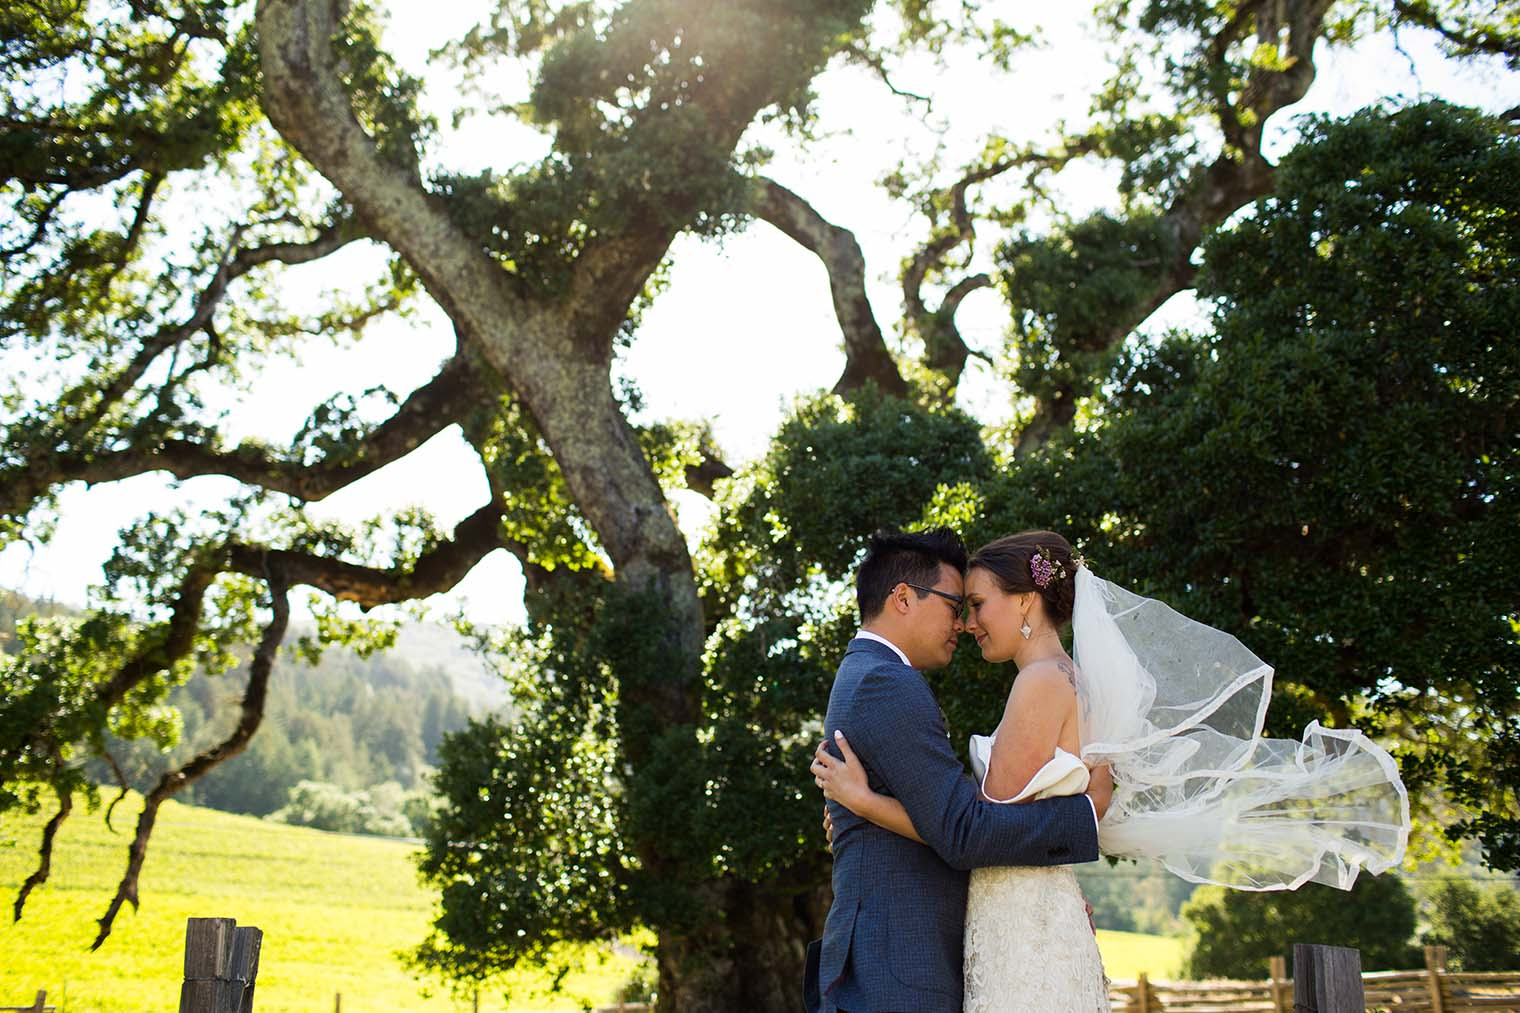 wedding photography at jack london state historic park